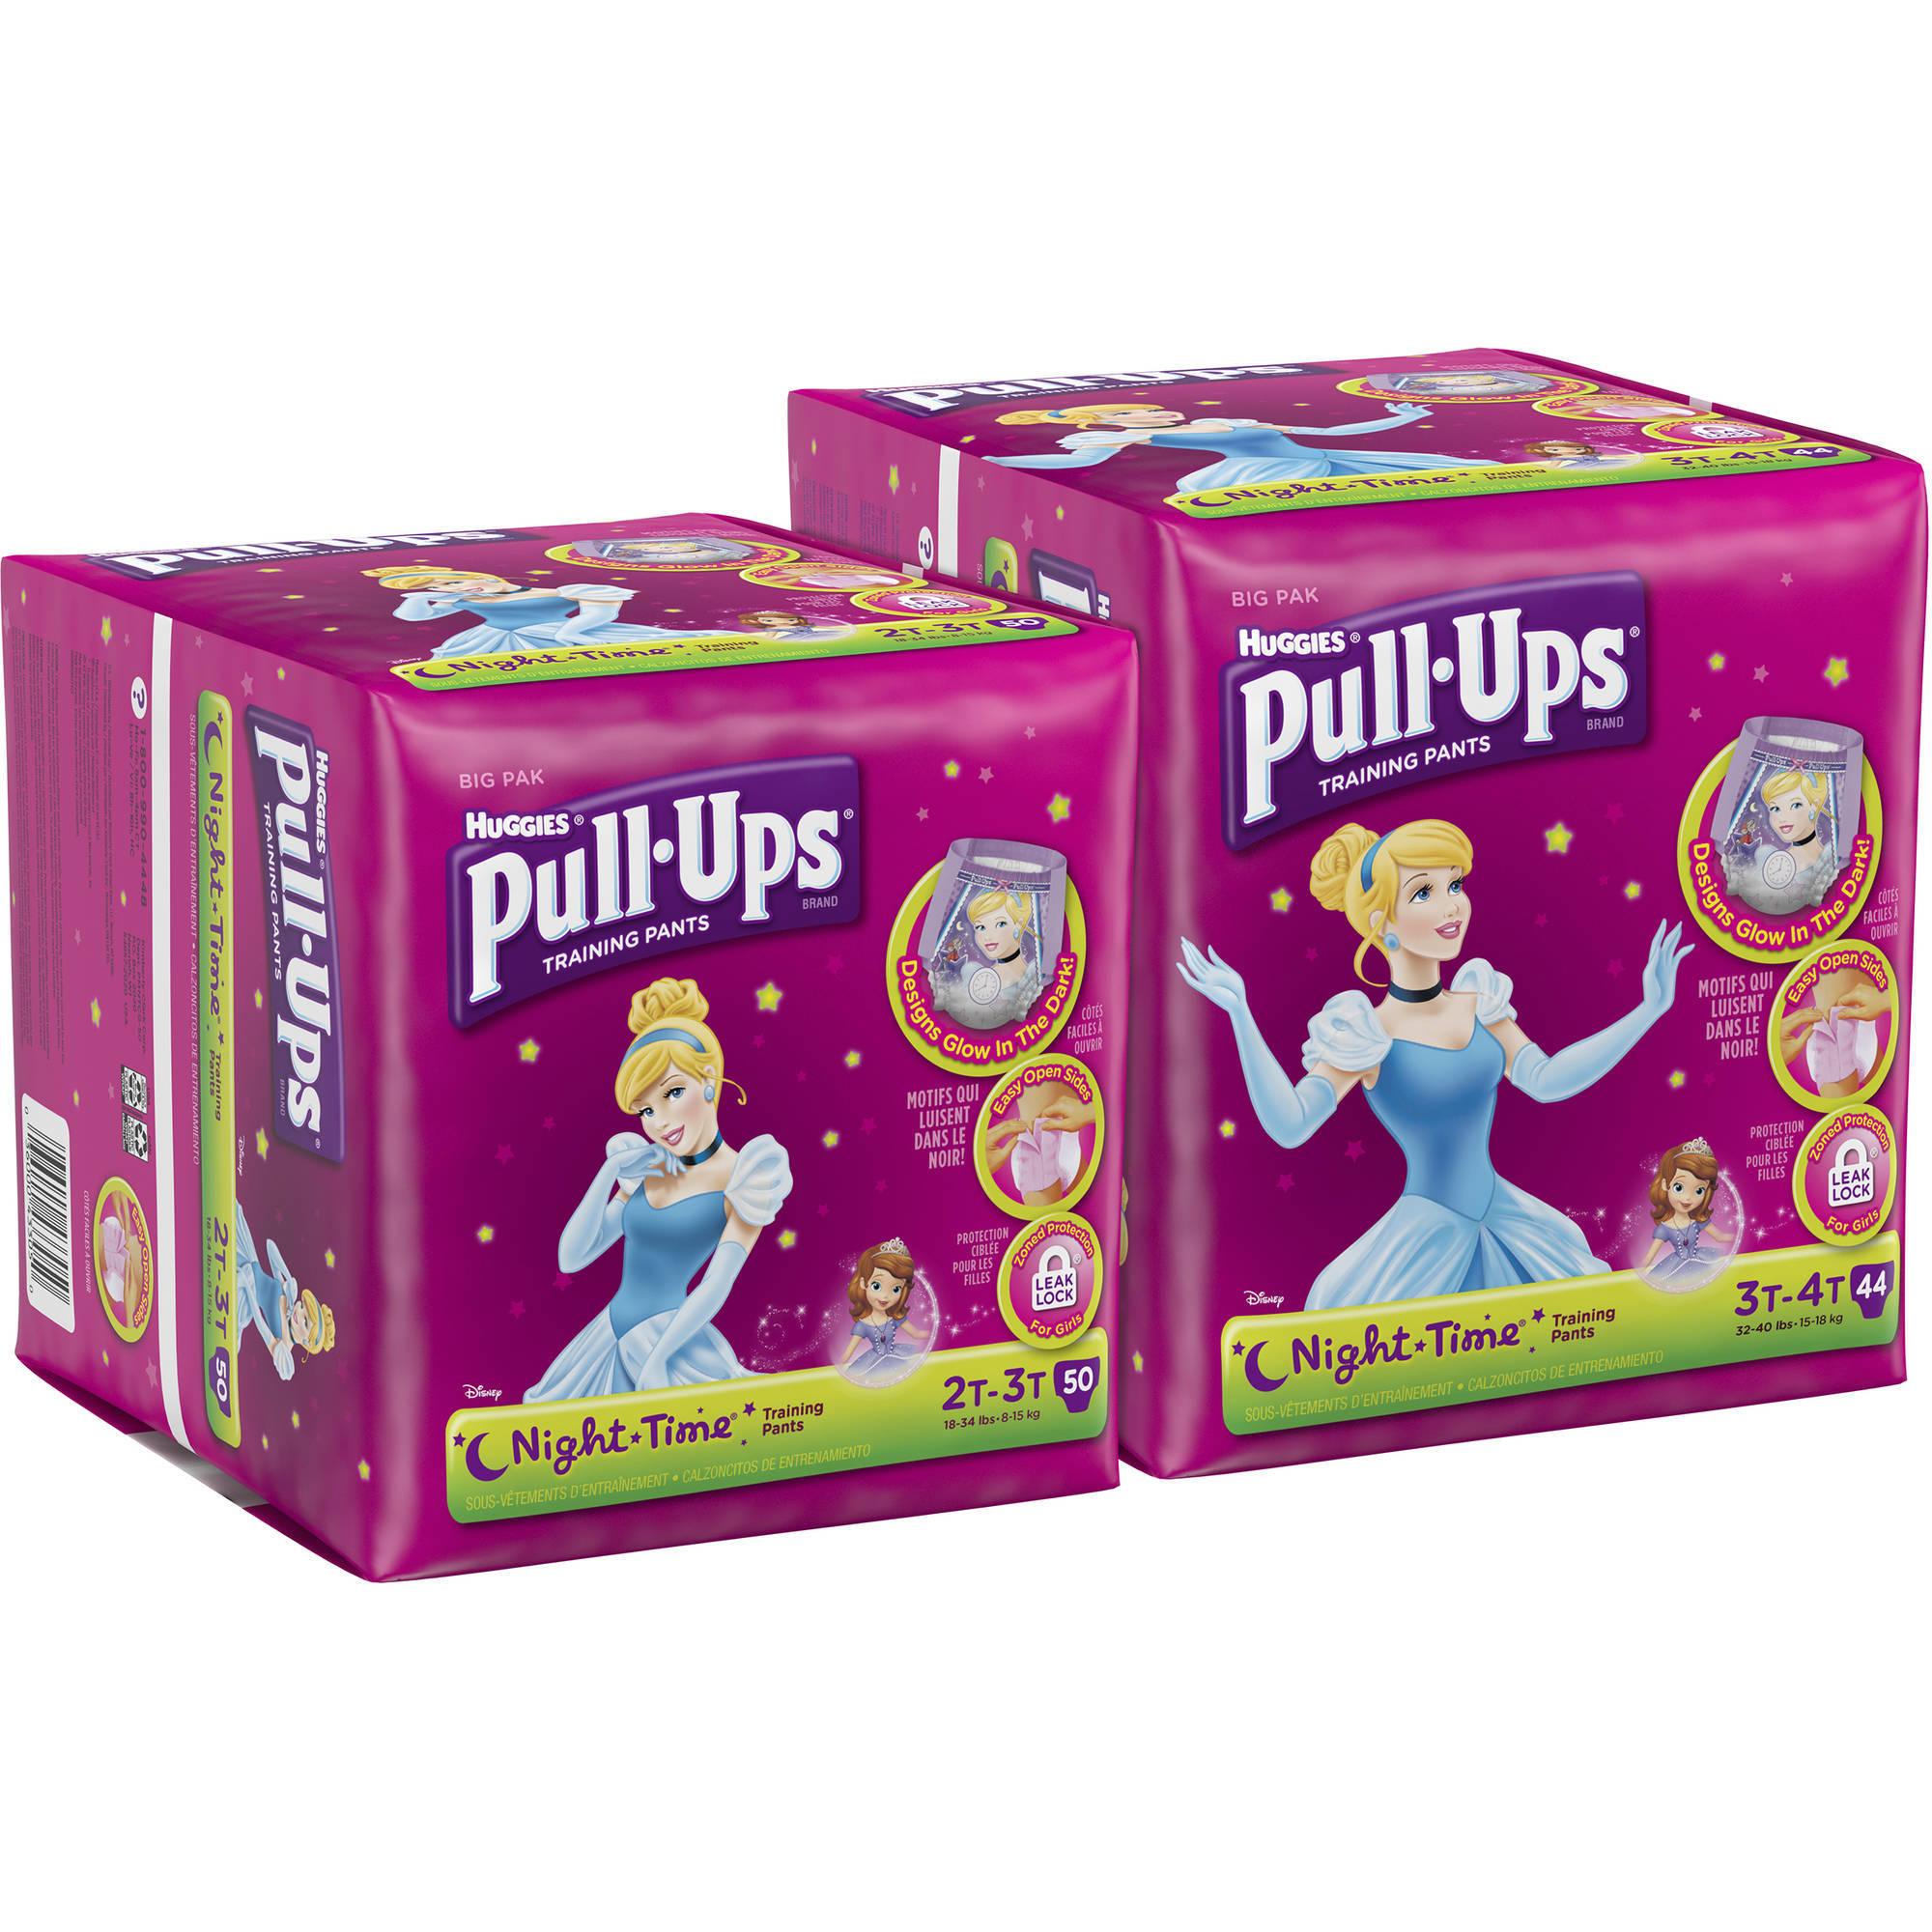 HUGGIES Pull-Ups Girls' Night-Time Training Pants, Big Pak, (Choose Your Size)